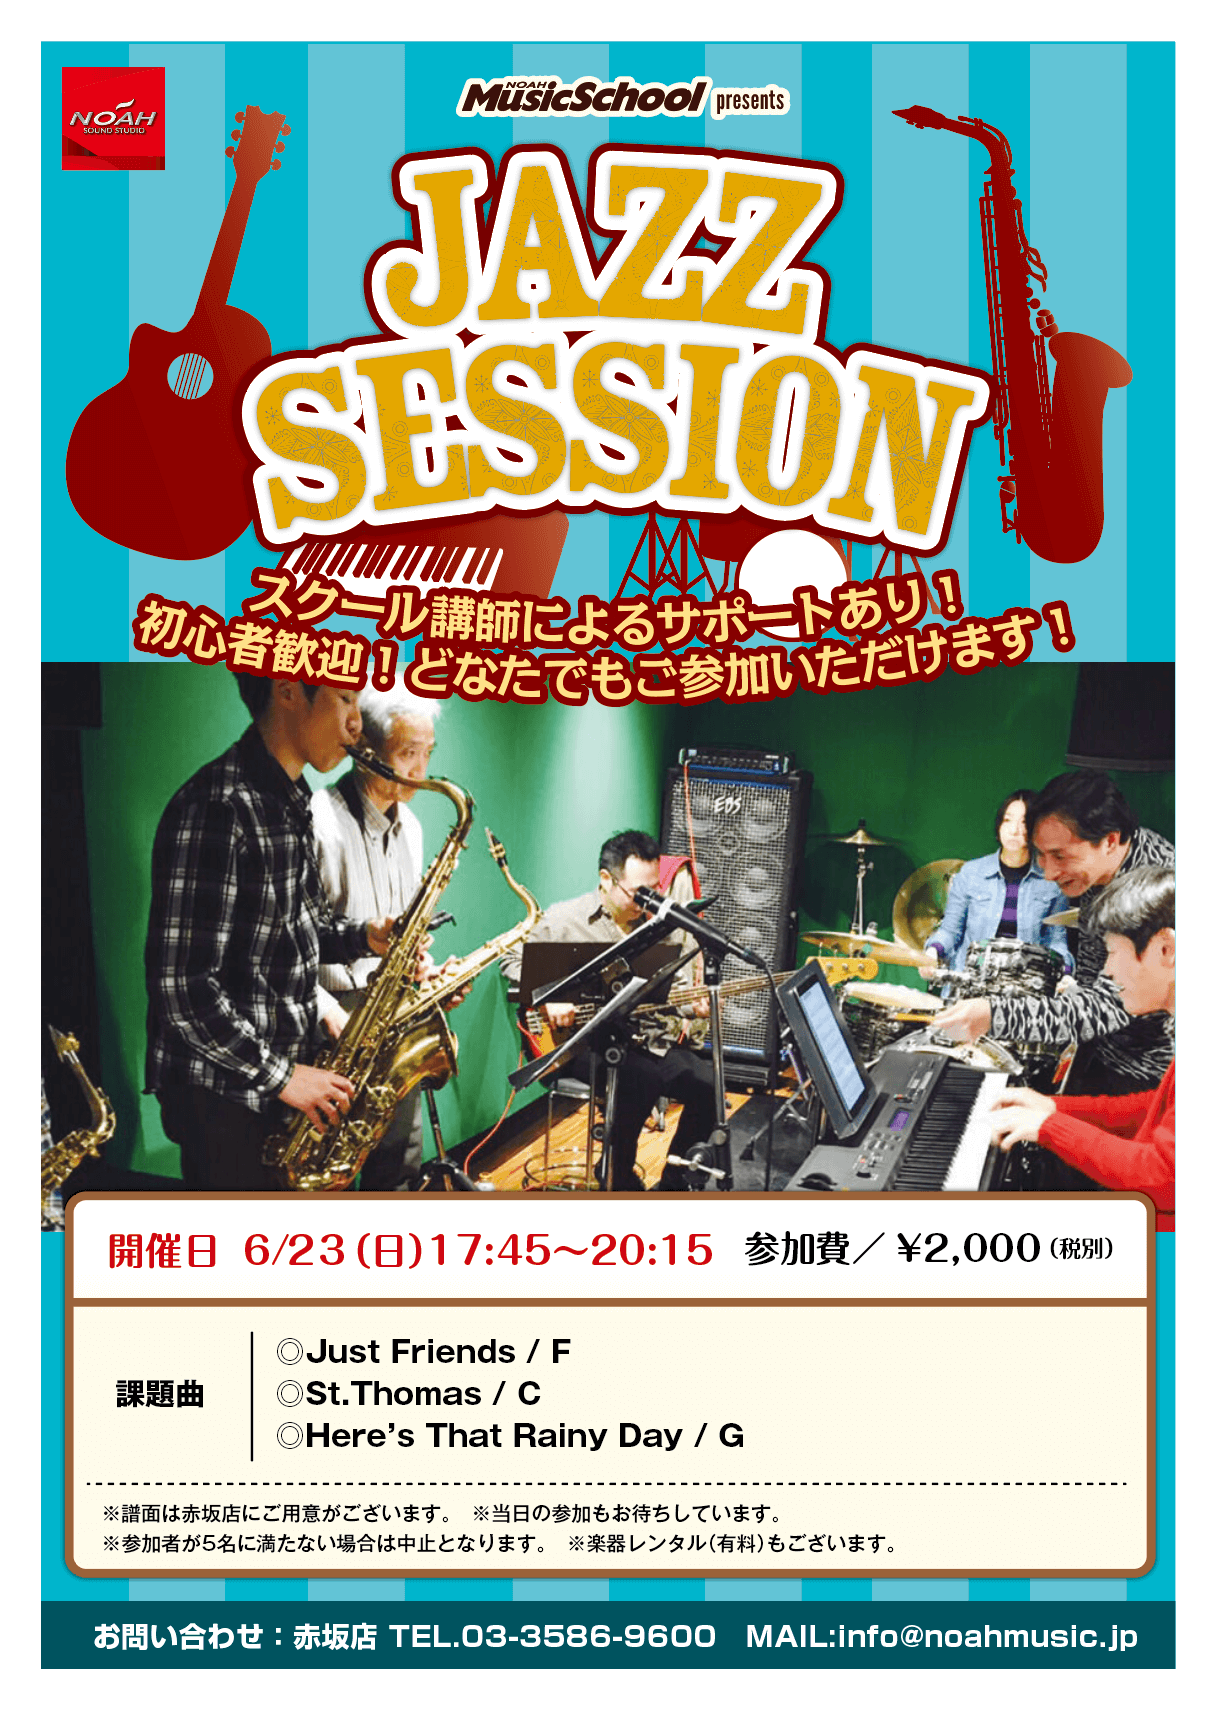 Music school presents JAZZ SESSION 6/23(日)開催!